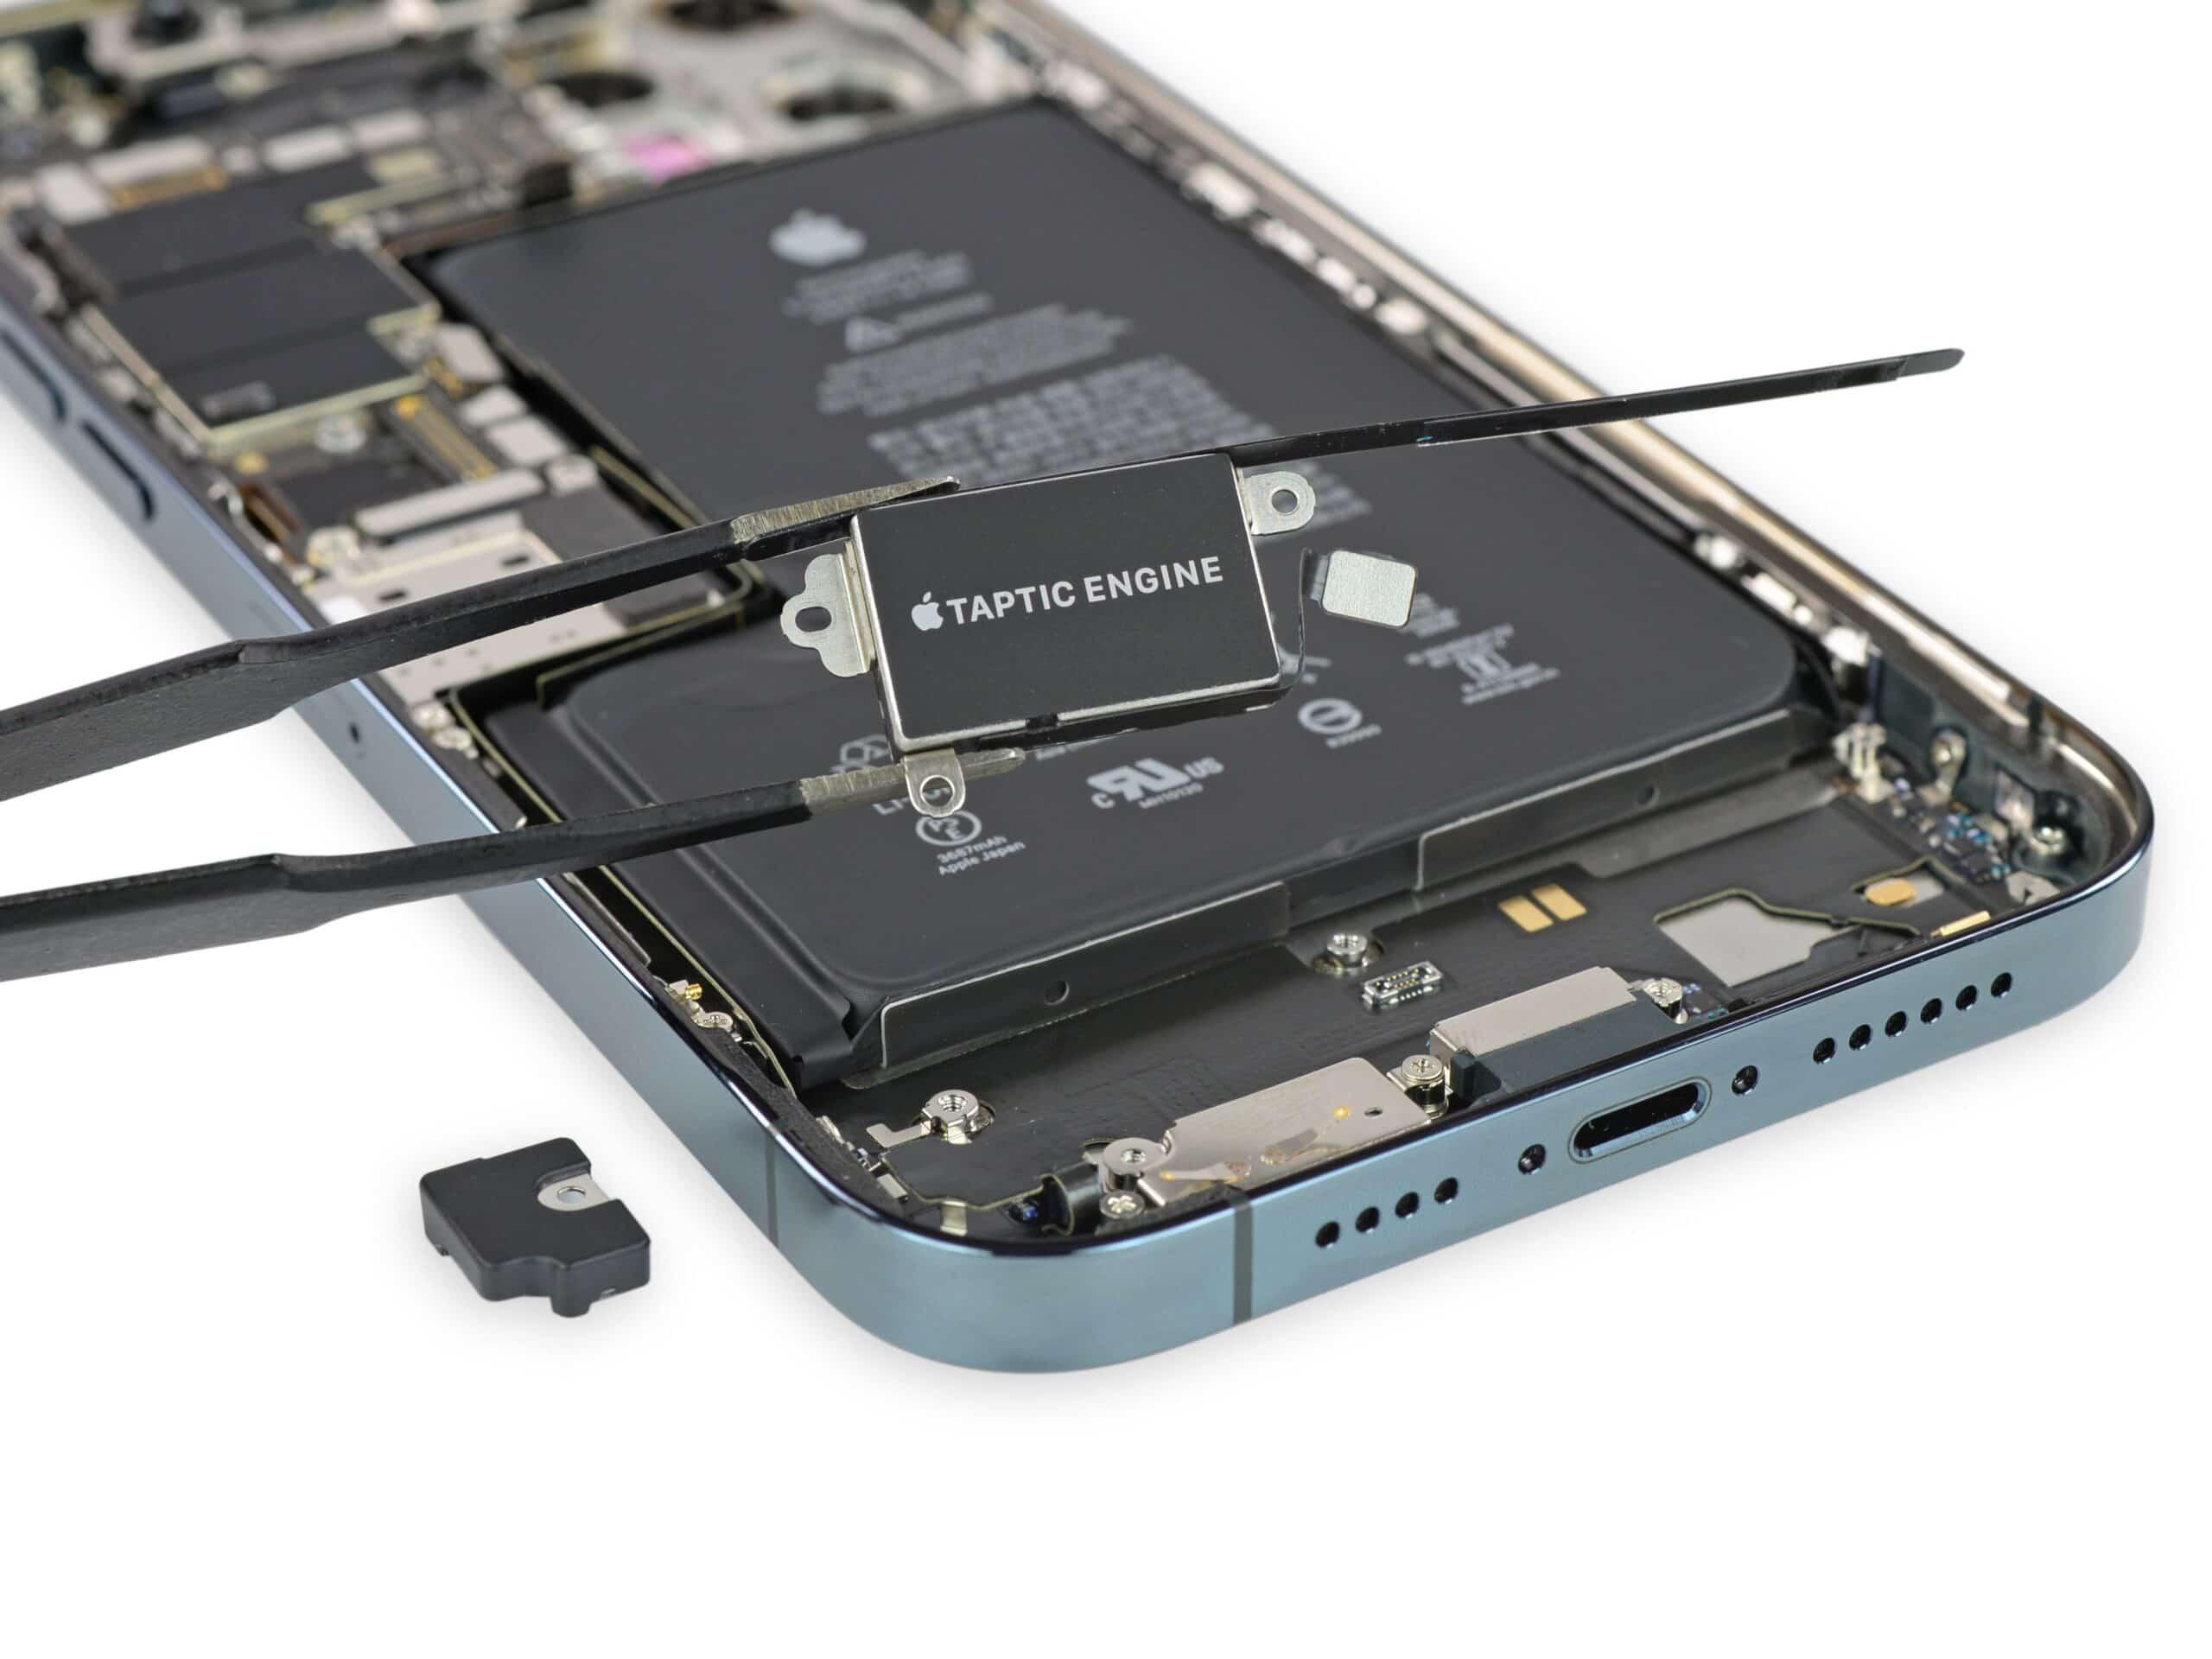 Taptic Engine do iPhone 12 Pro Max (iFixit)